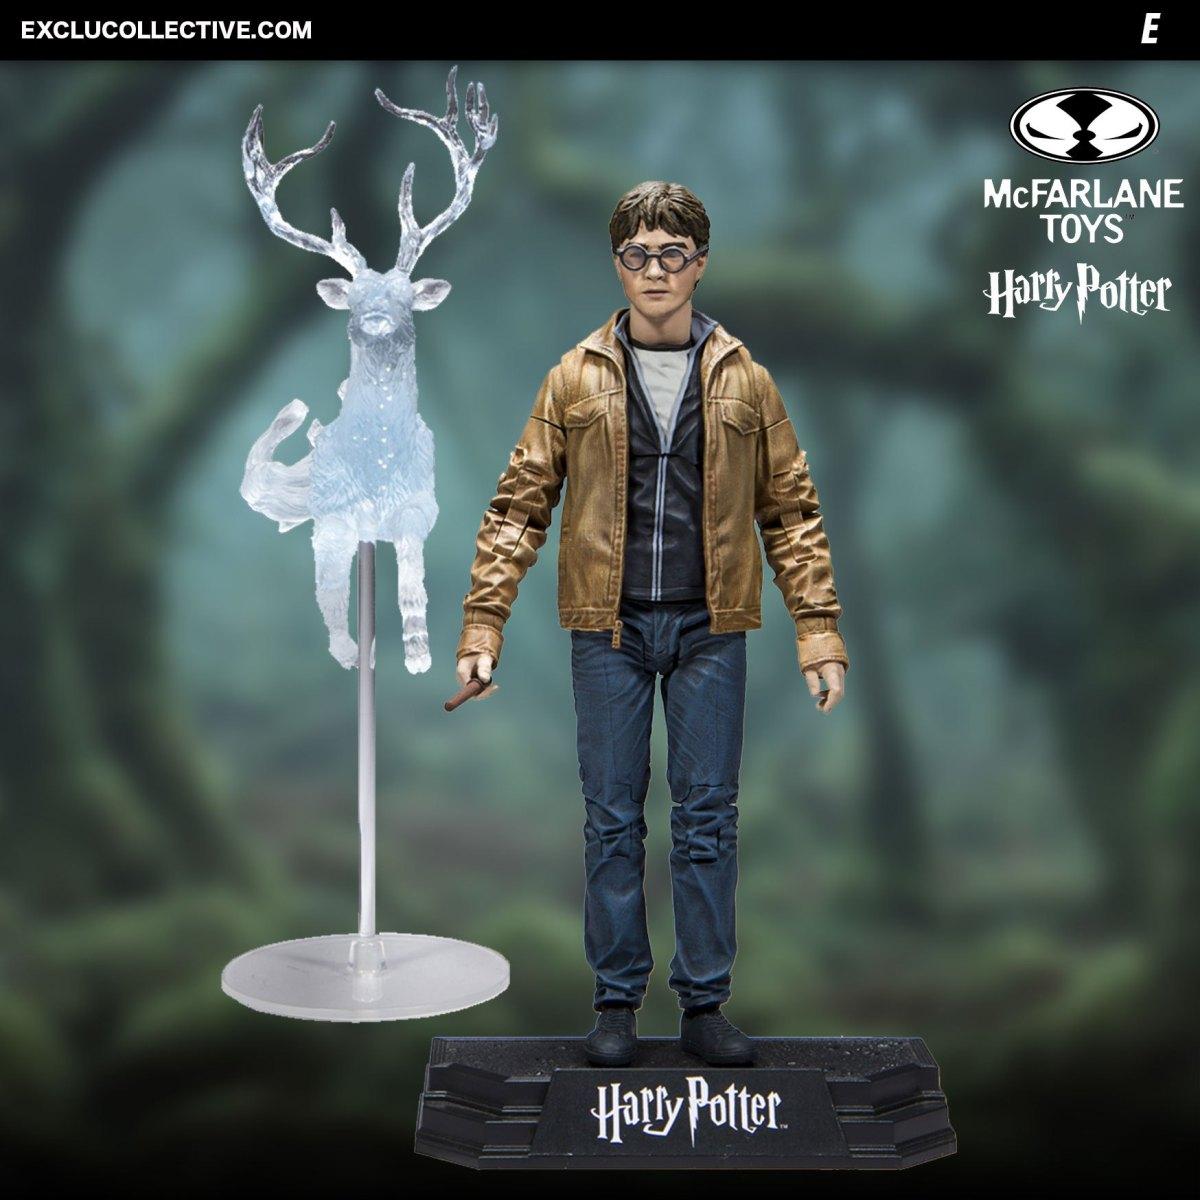 McFarlane Harry Potter Action Figure - Harry